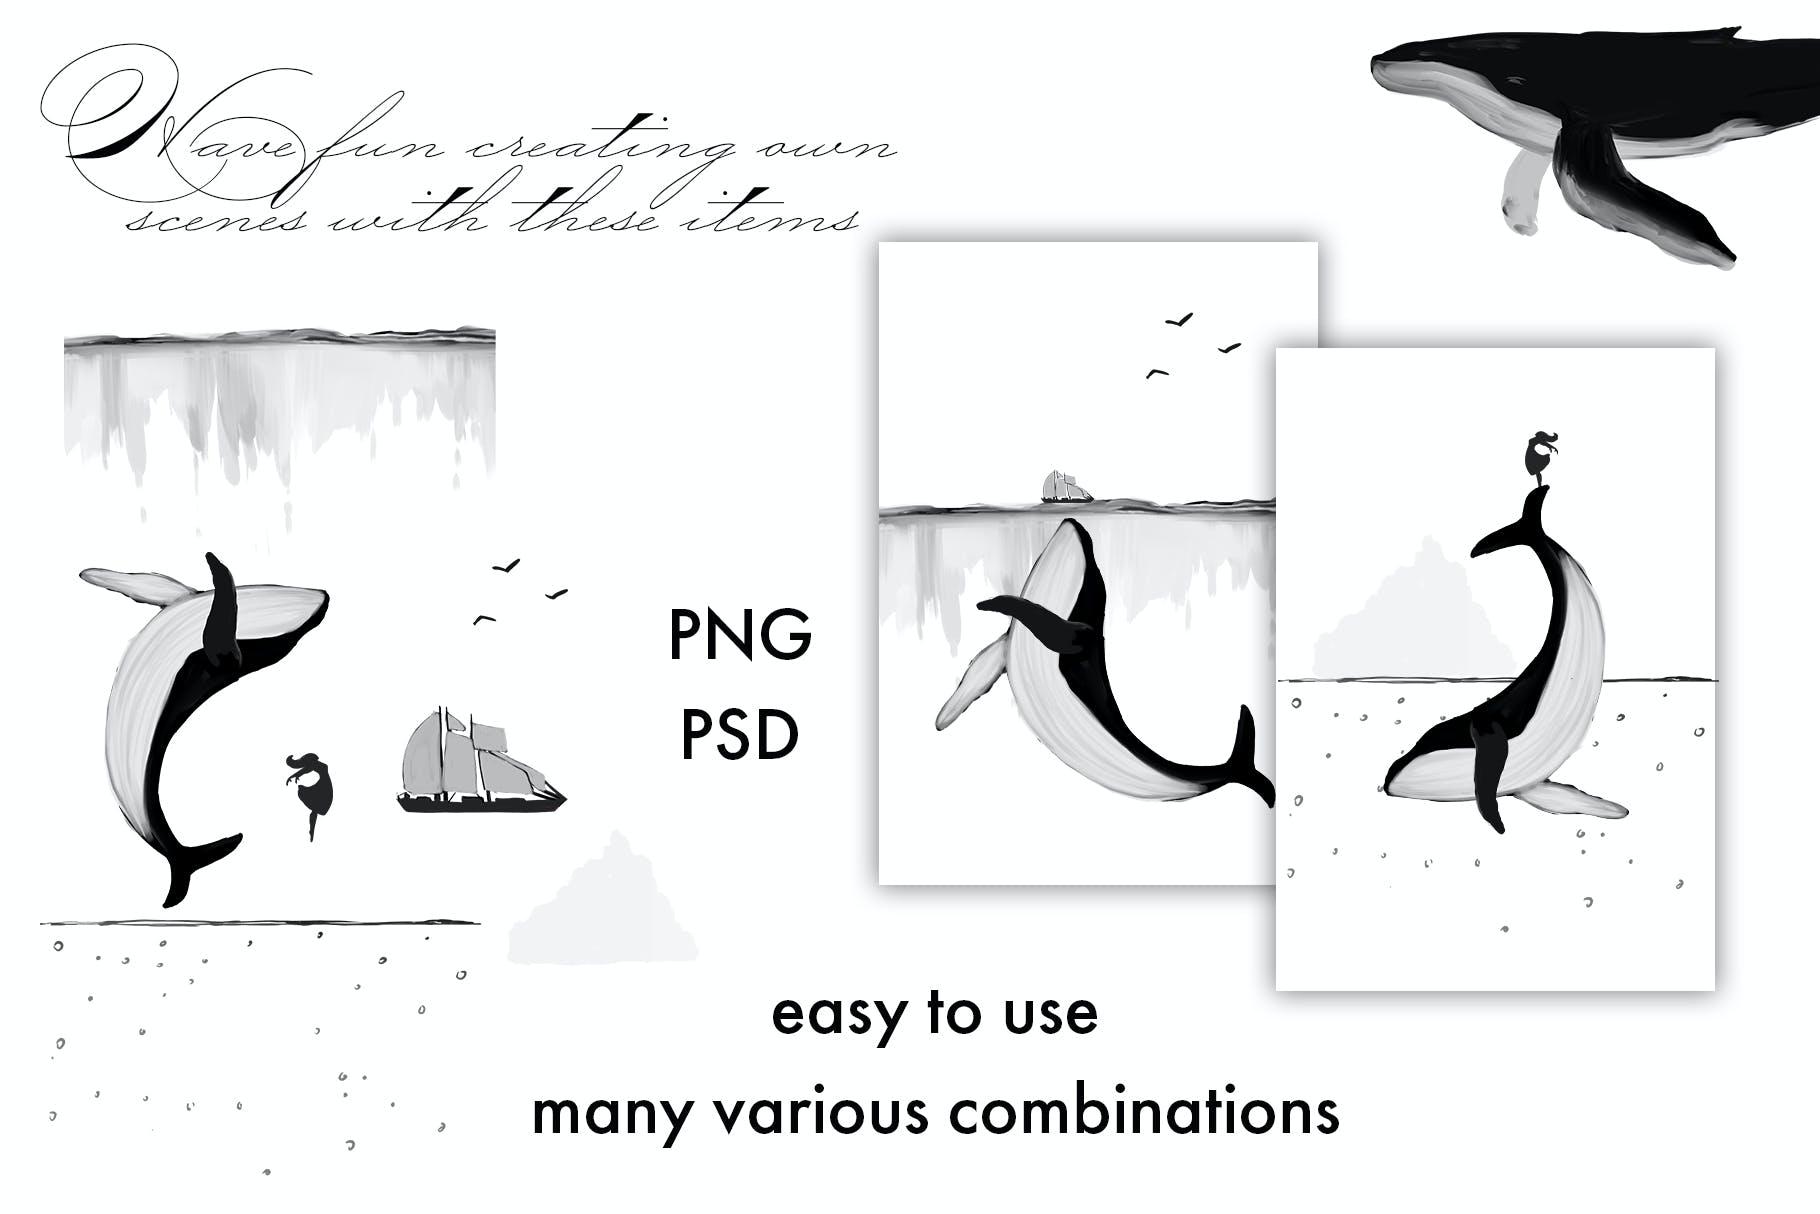 30款精美高清手绘鲸鱼轮船山脉图片素材 Whales – Black And White Prints插图(3)